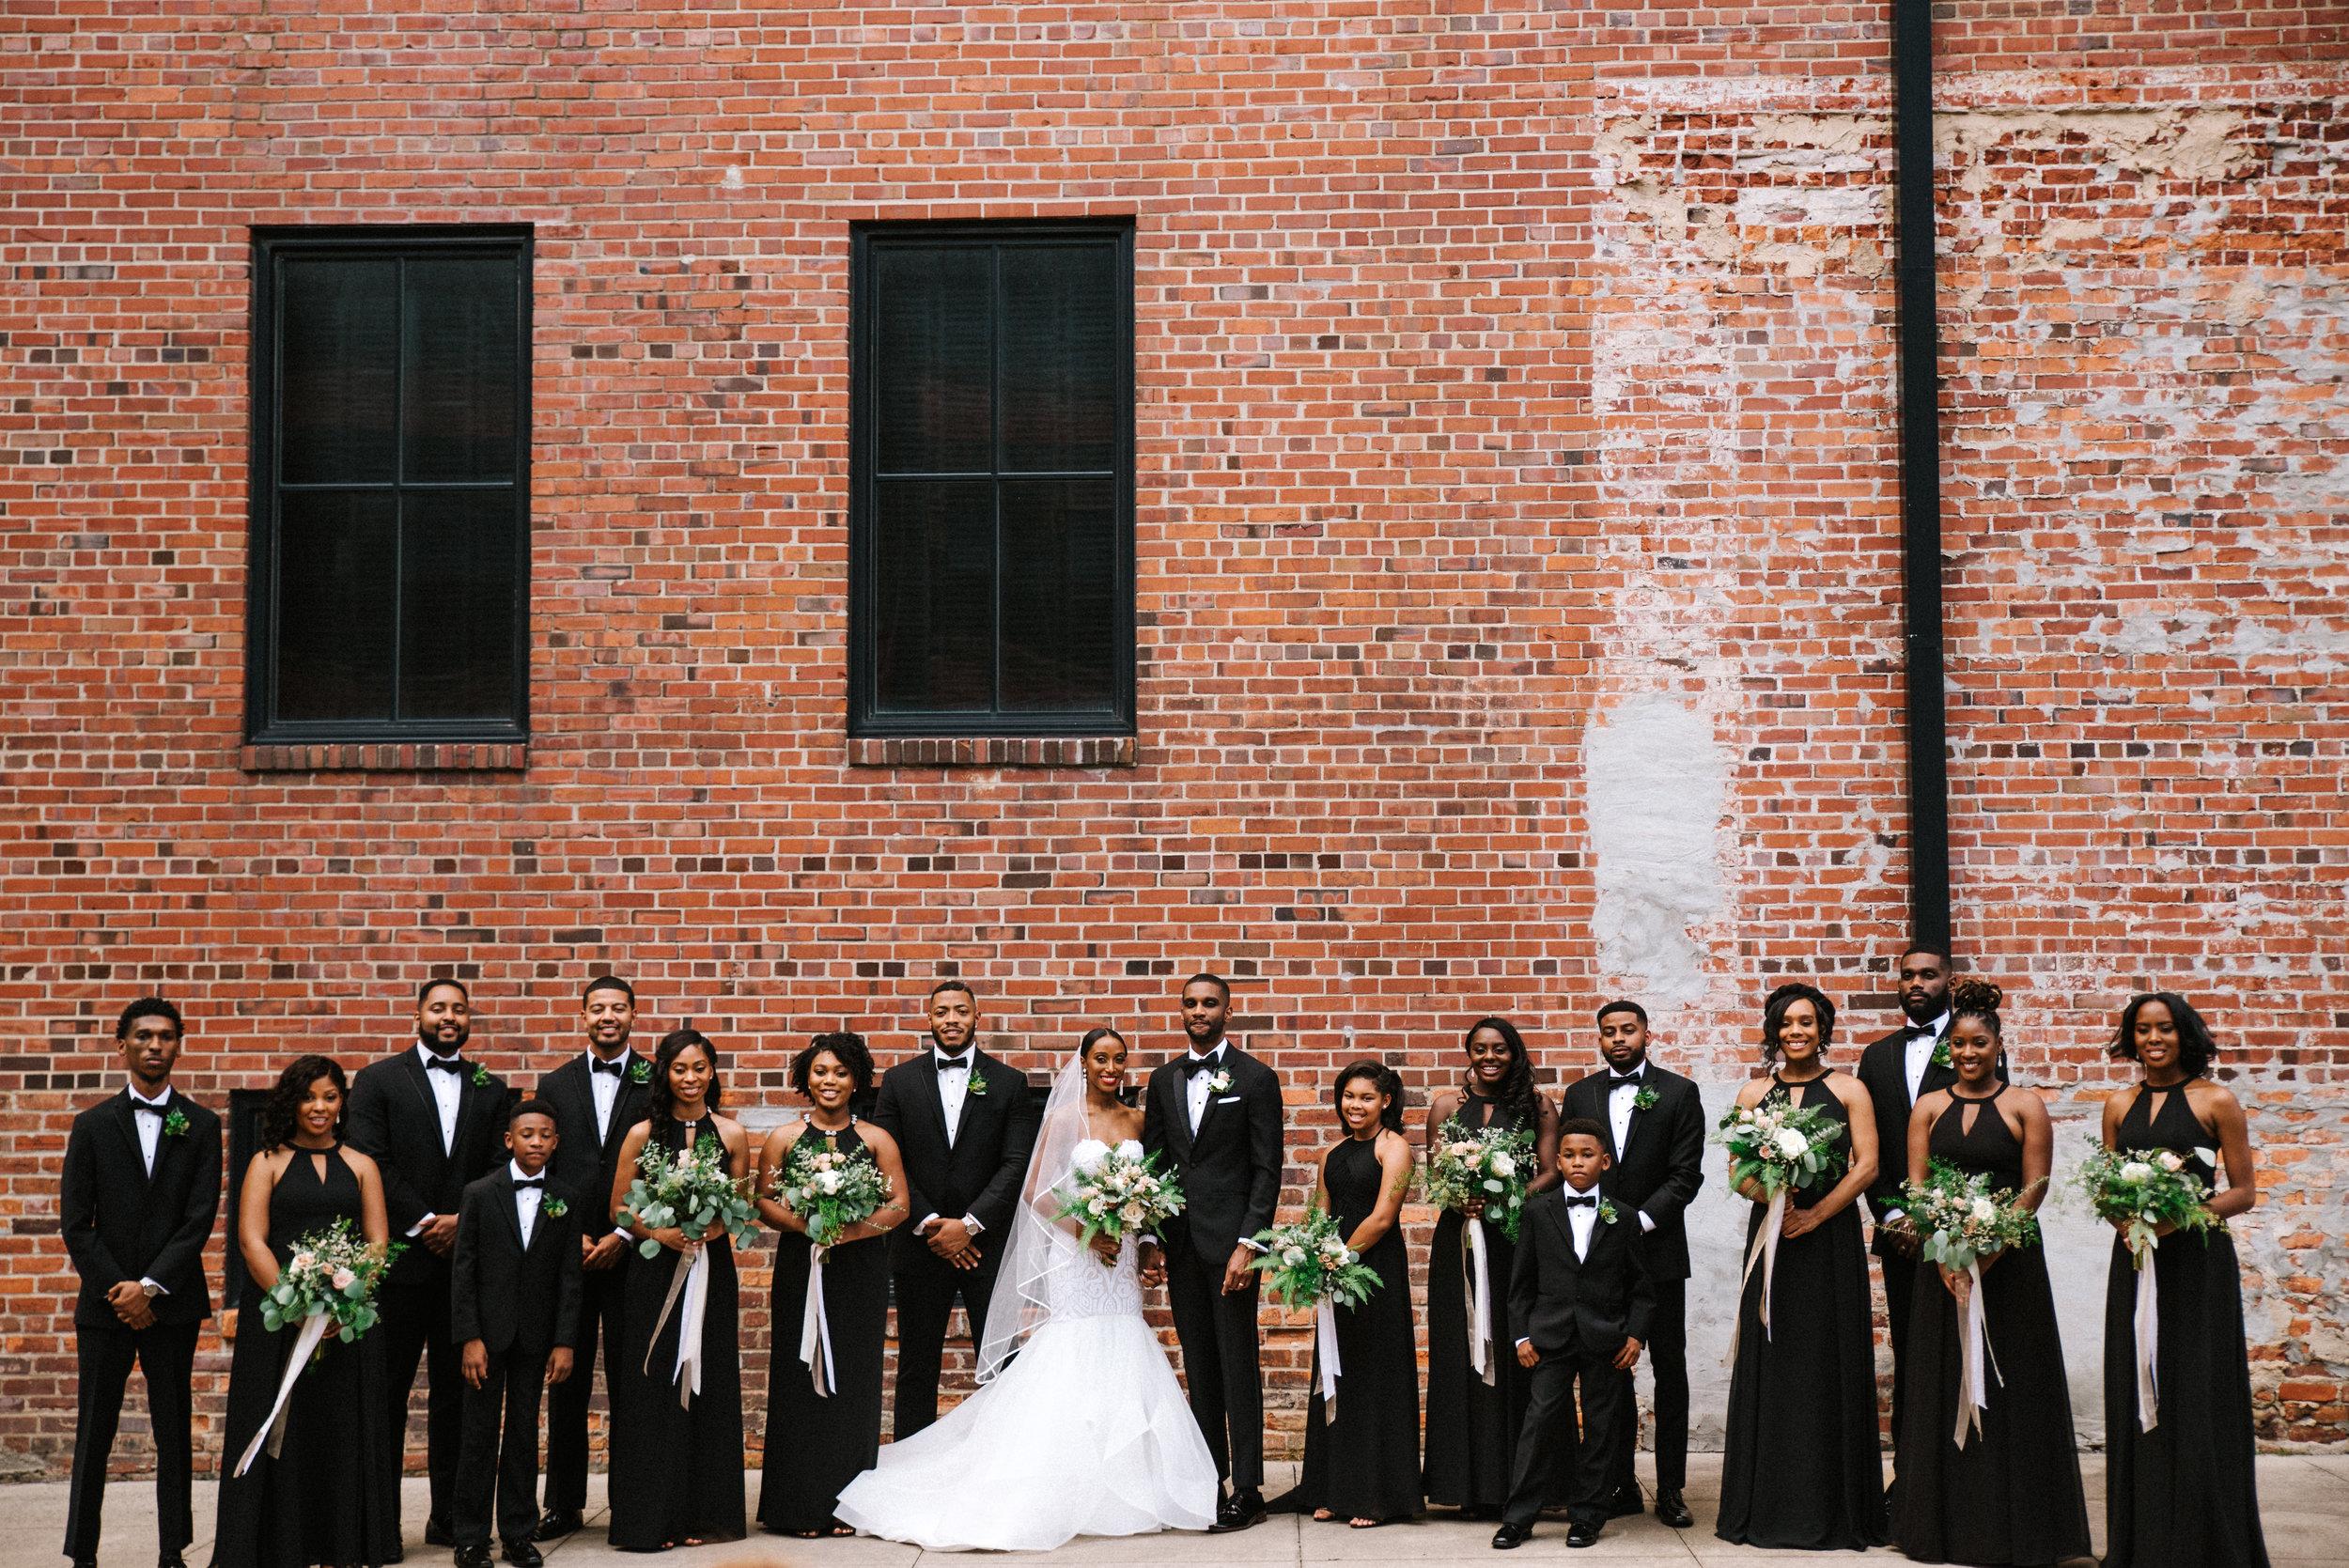 The Lofts at Union Square, High Point, NC. Wedding Party photos. North Carolina Wedding Photographer, Marina Rey Photography.